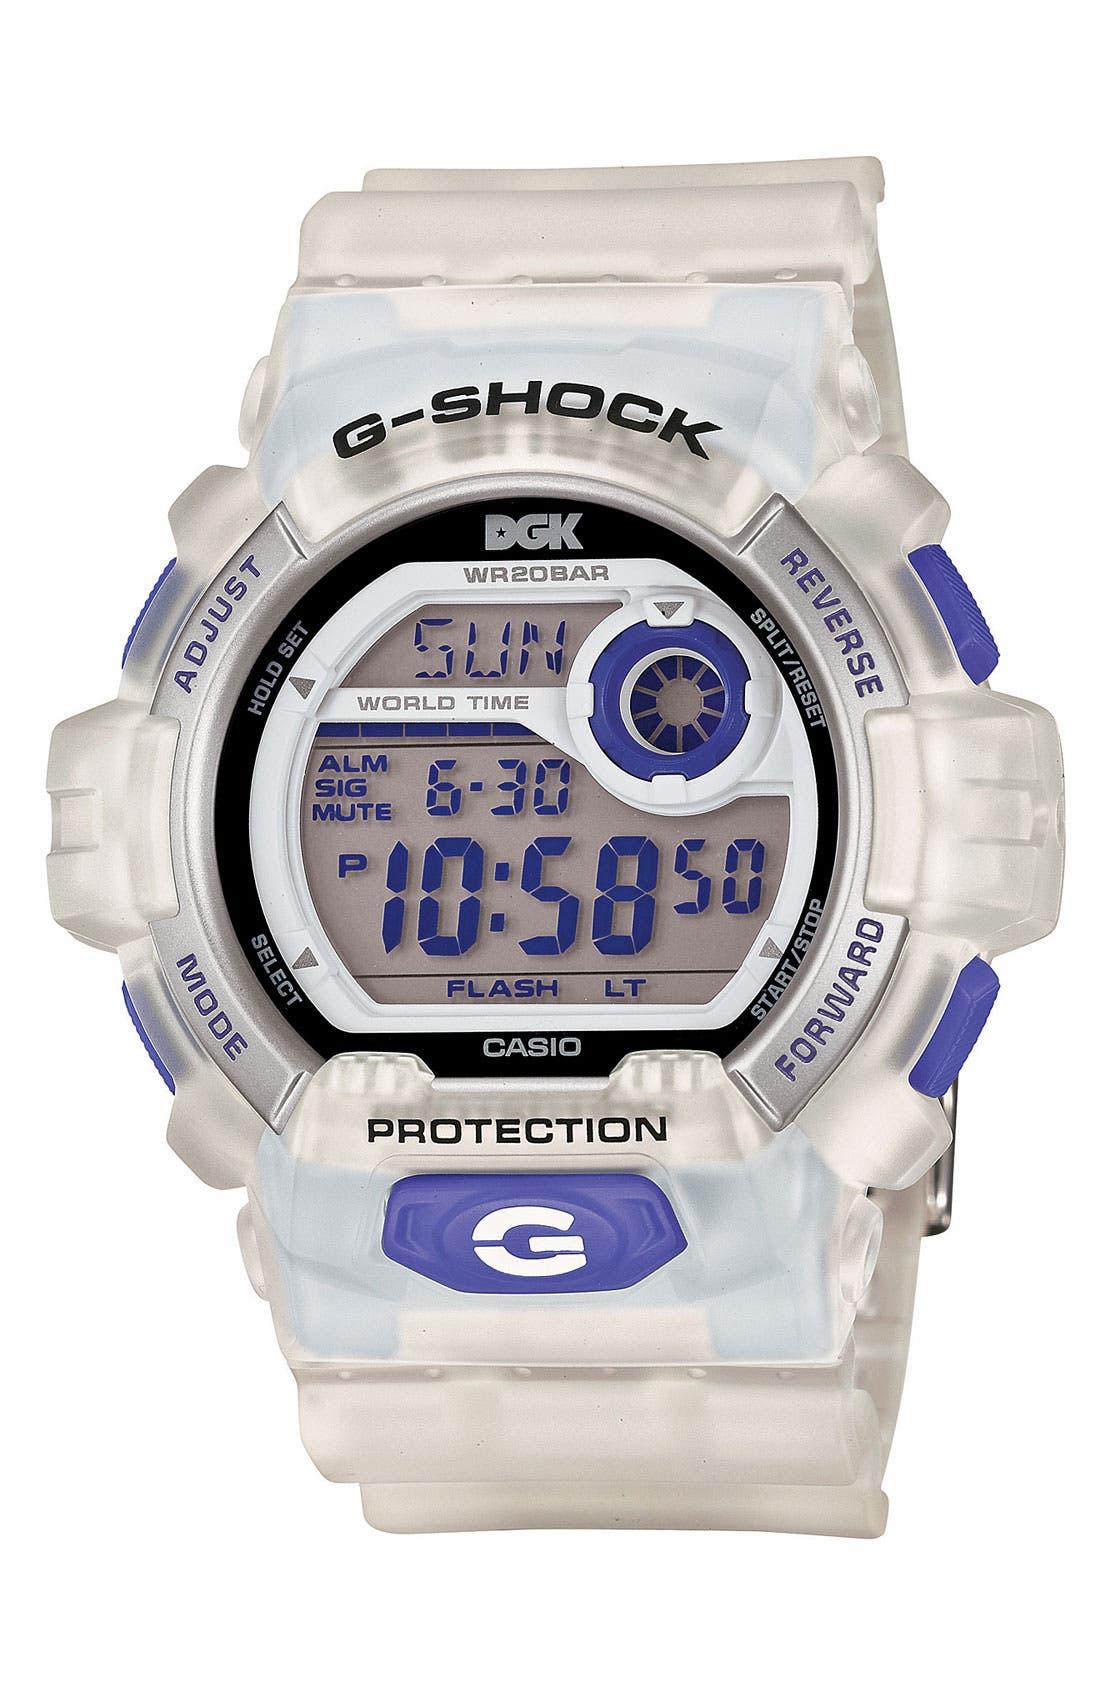 Main Image - G-Shock 'DGK' Digital Watch, 55mm